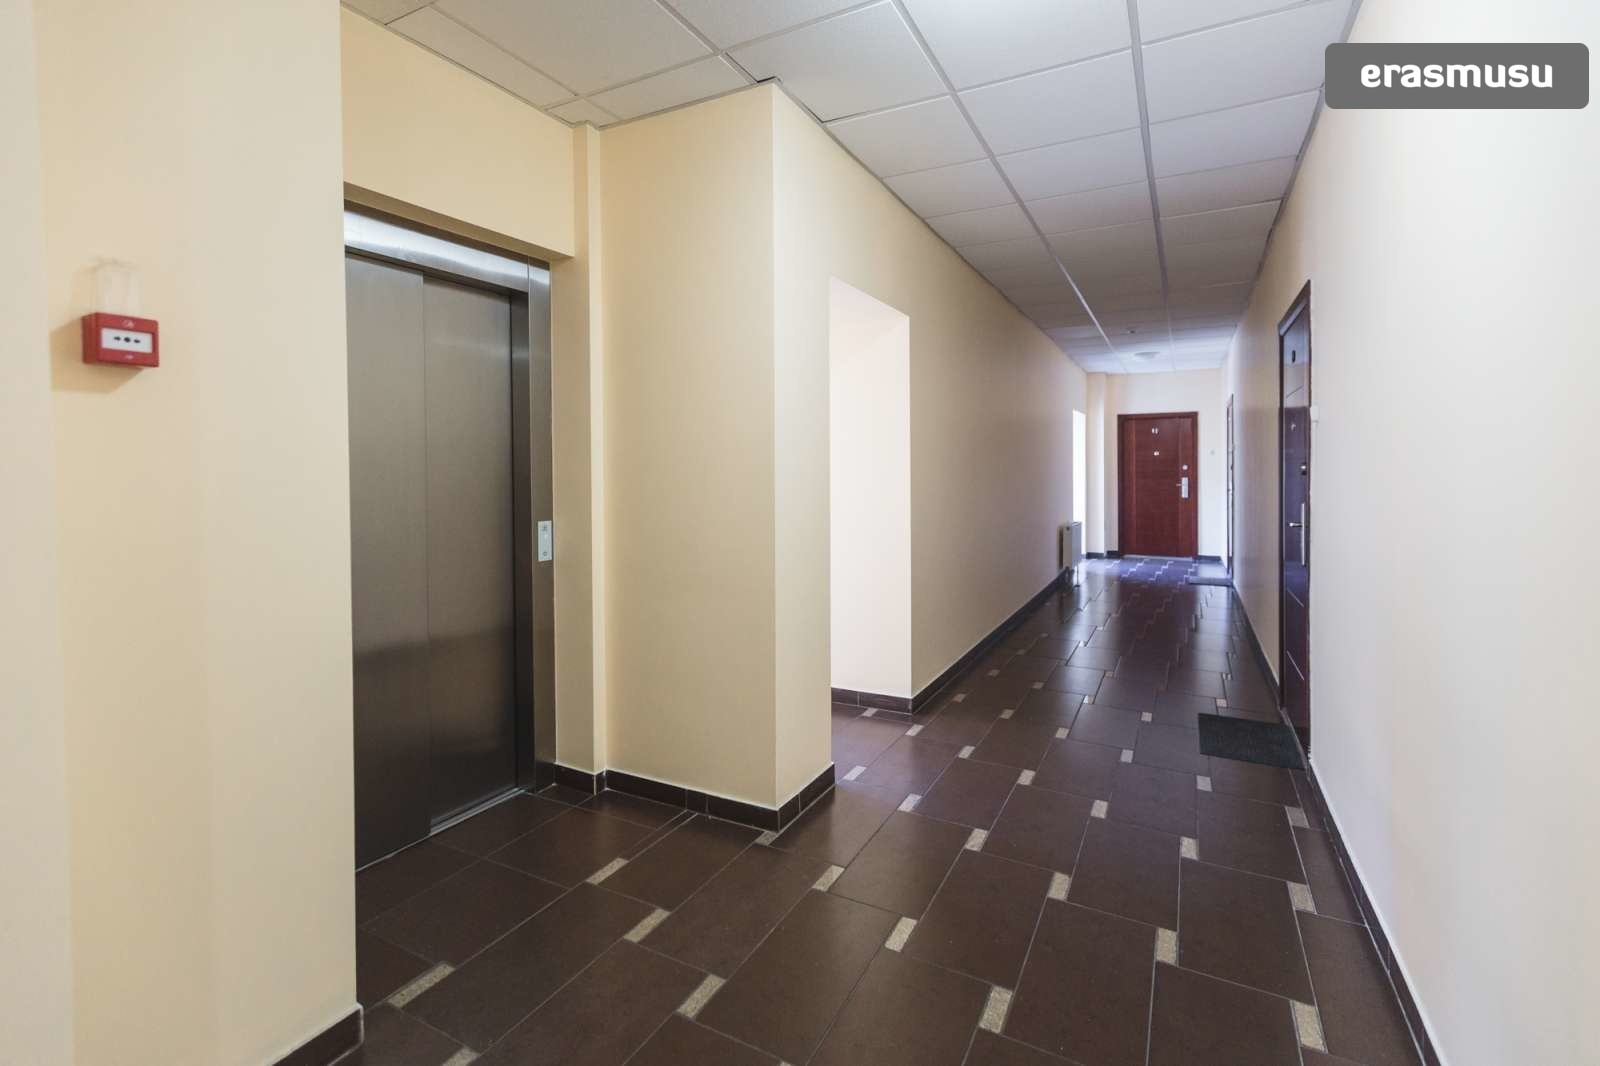 1-bedroom-apartment-rent-maskavas-forstate-d3c7c7fb24b3e25b4c7f1